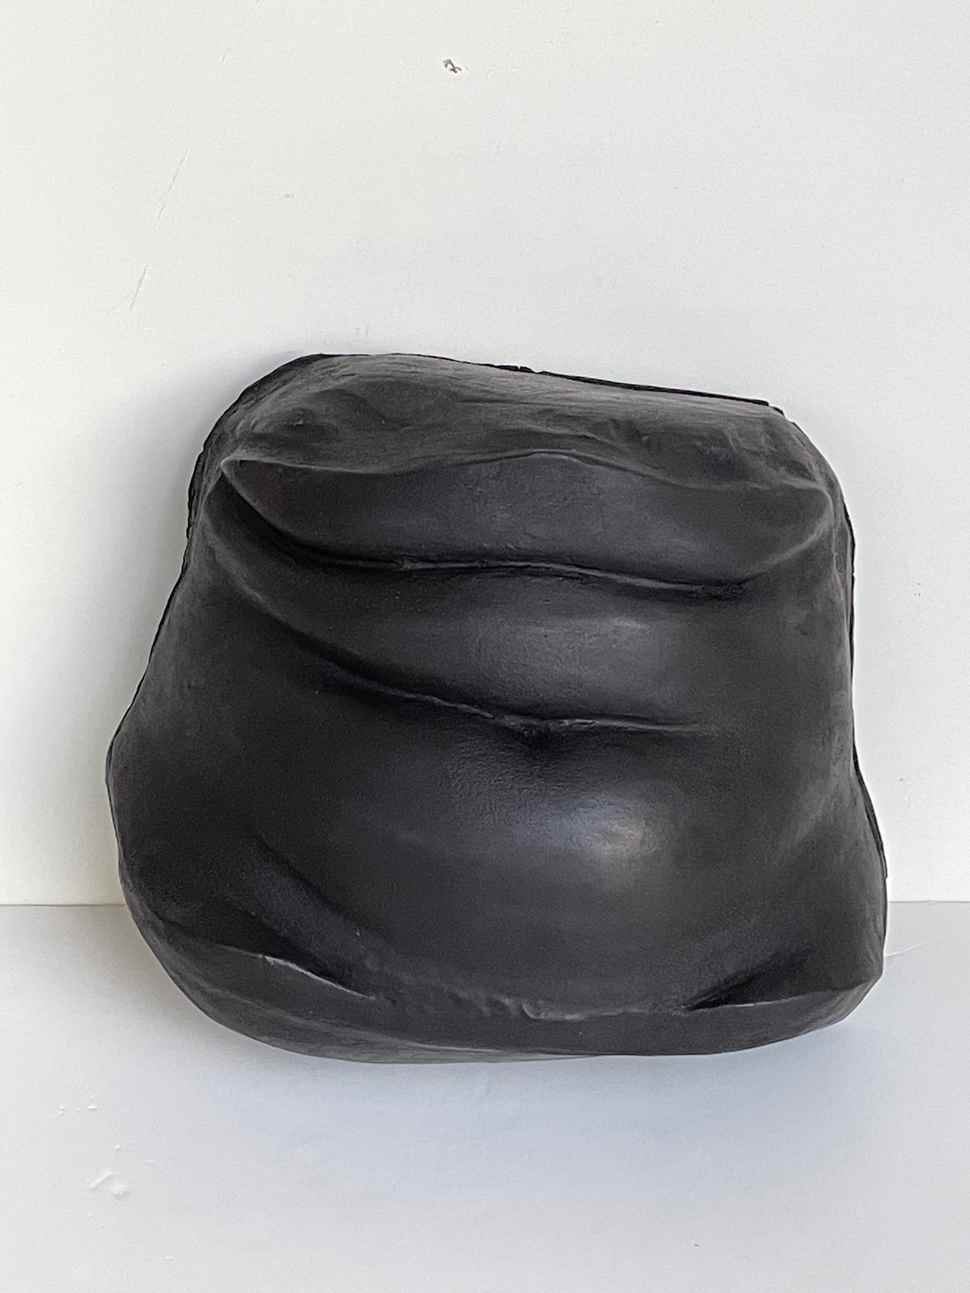 Ventre-coussin (Belly cushion) - Alina Szapocznikow (1926 - 1973)